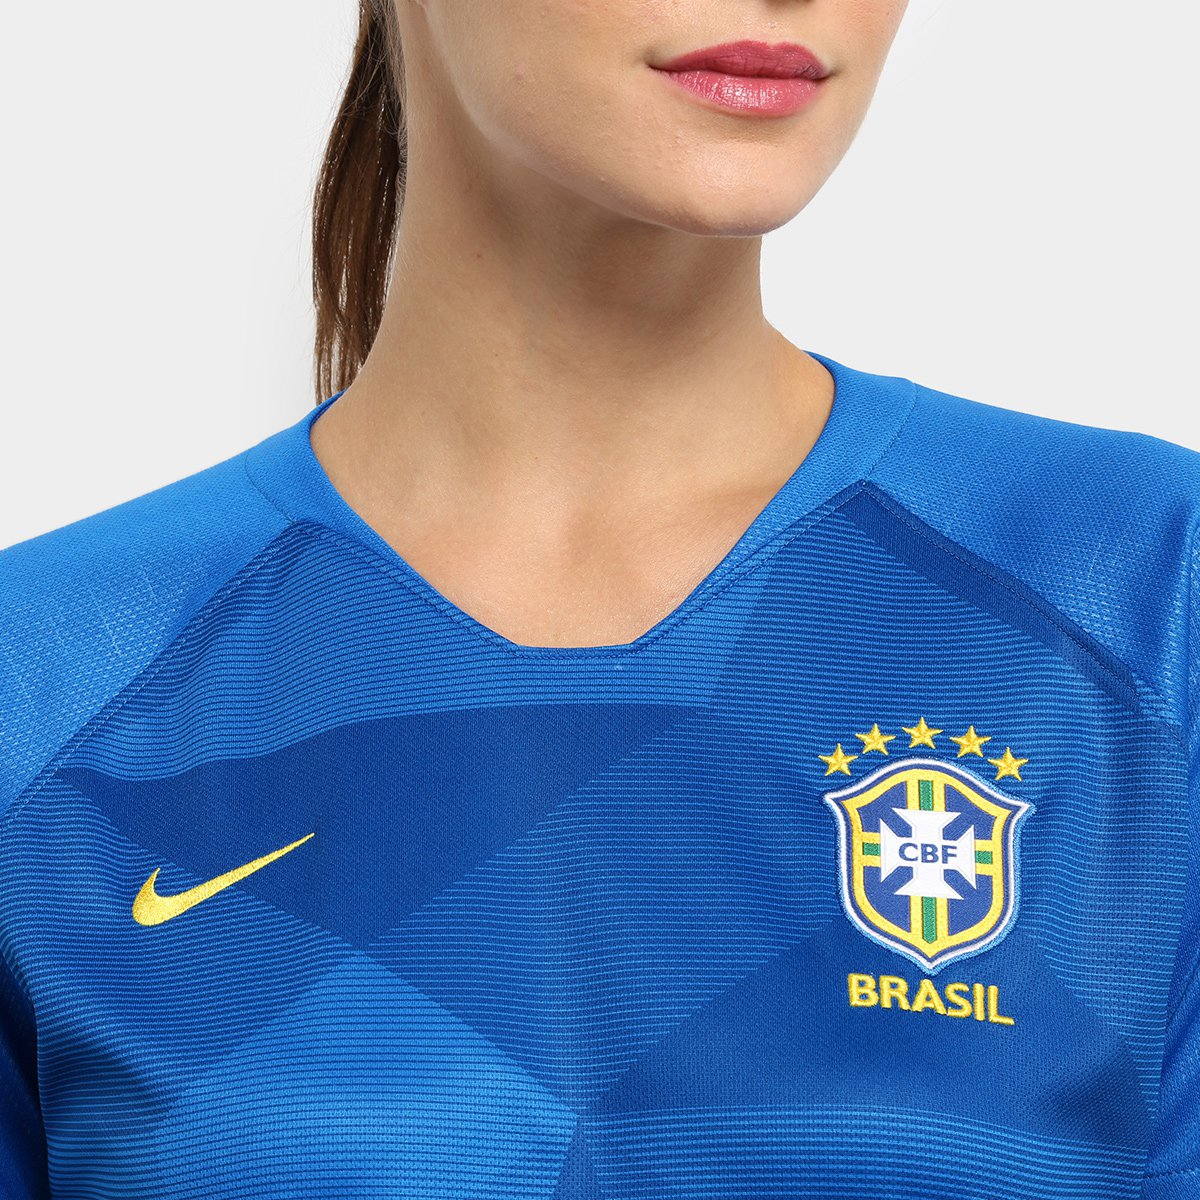 Camisa Seleção Brasil II 2018 s n° - Torcedor Nike Feminina - Azul ... 9e4a6641ac16a